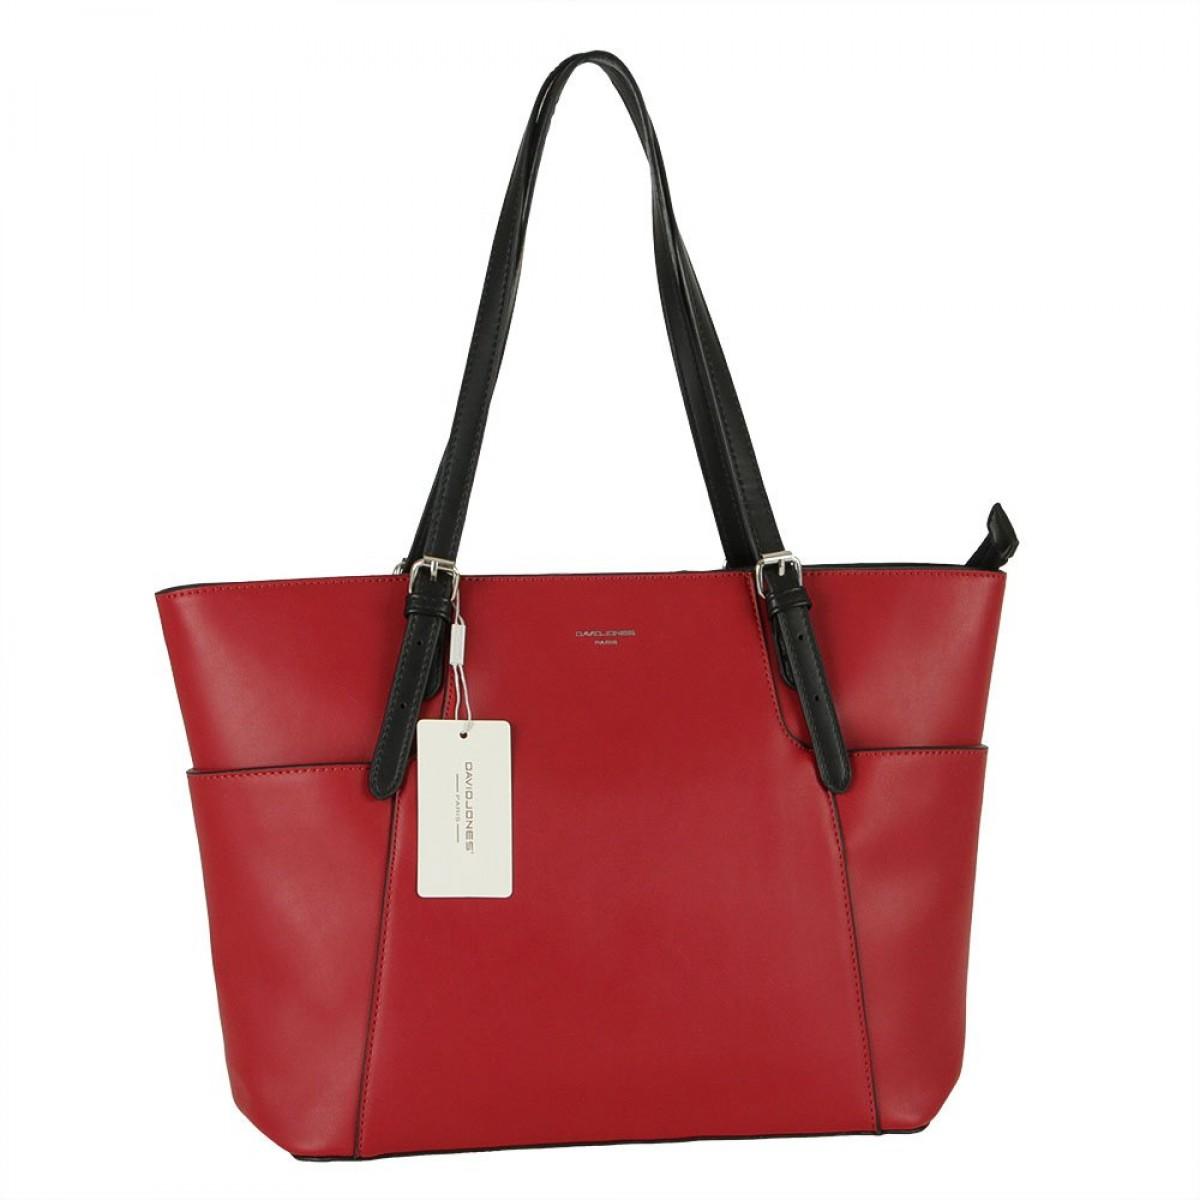 Жіноча сумка David Jones CM5887 DARK RED